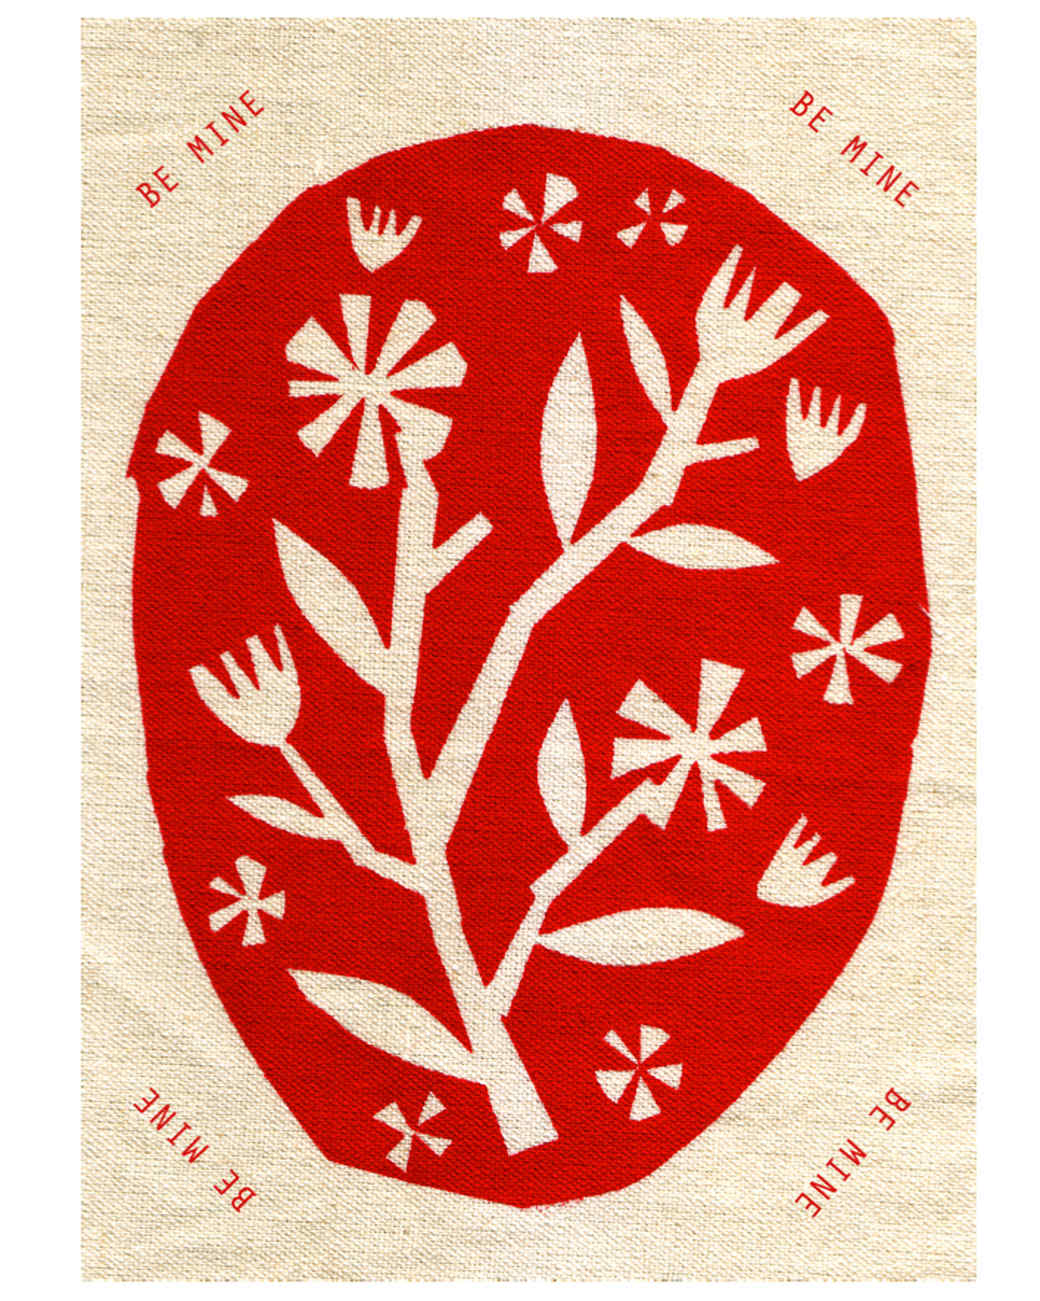 Valentine's Day Card Clip Art and Templates | Martha Stewart